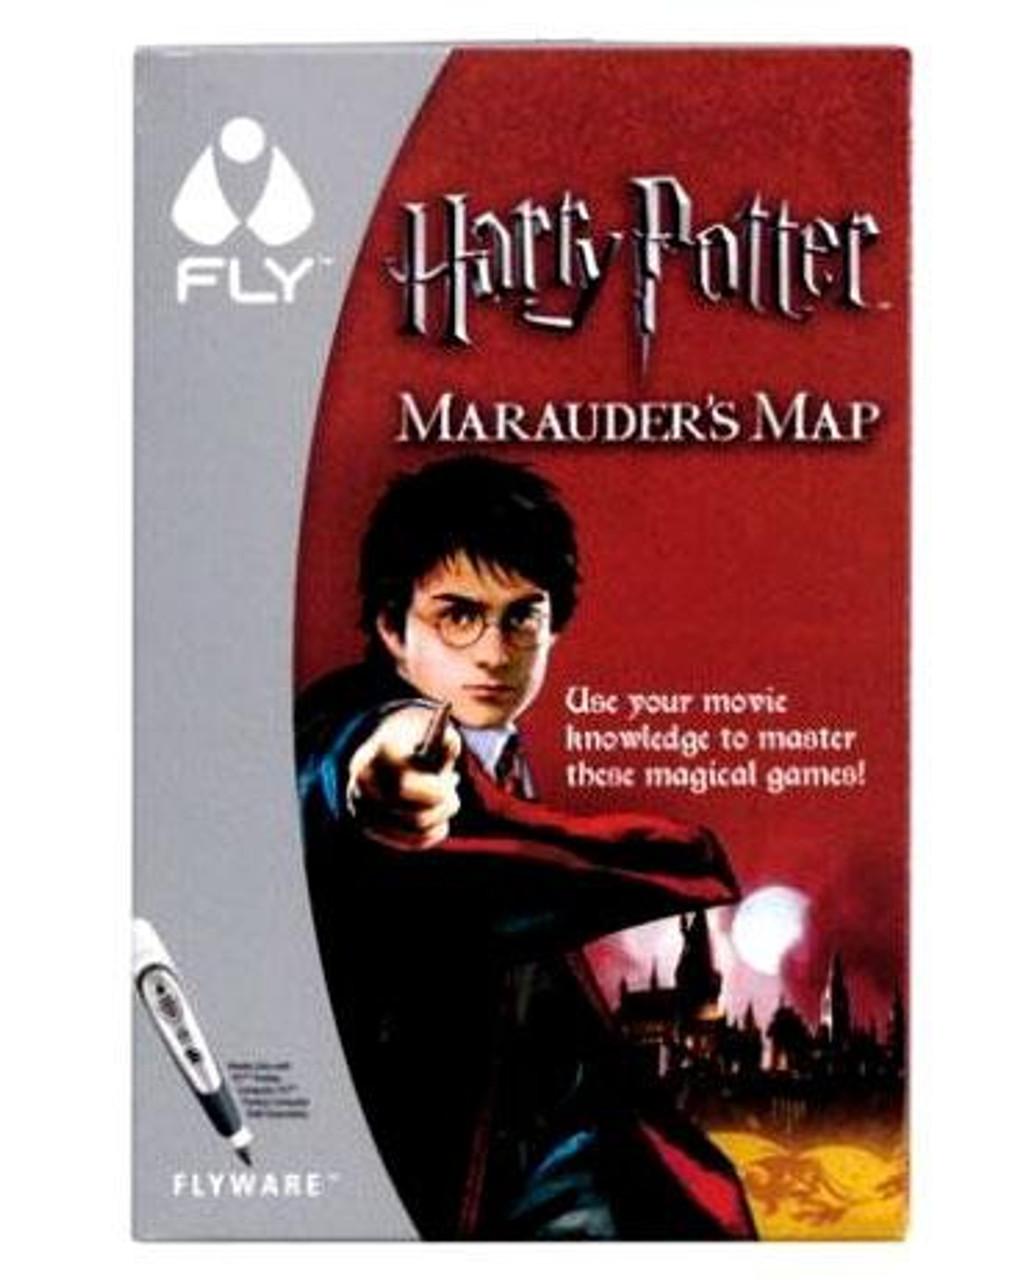 Harry Potter FLYware Marauder's Map Game Book